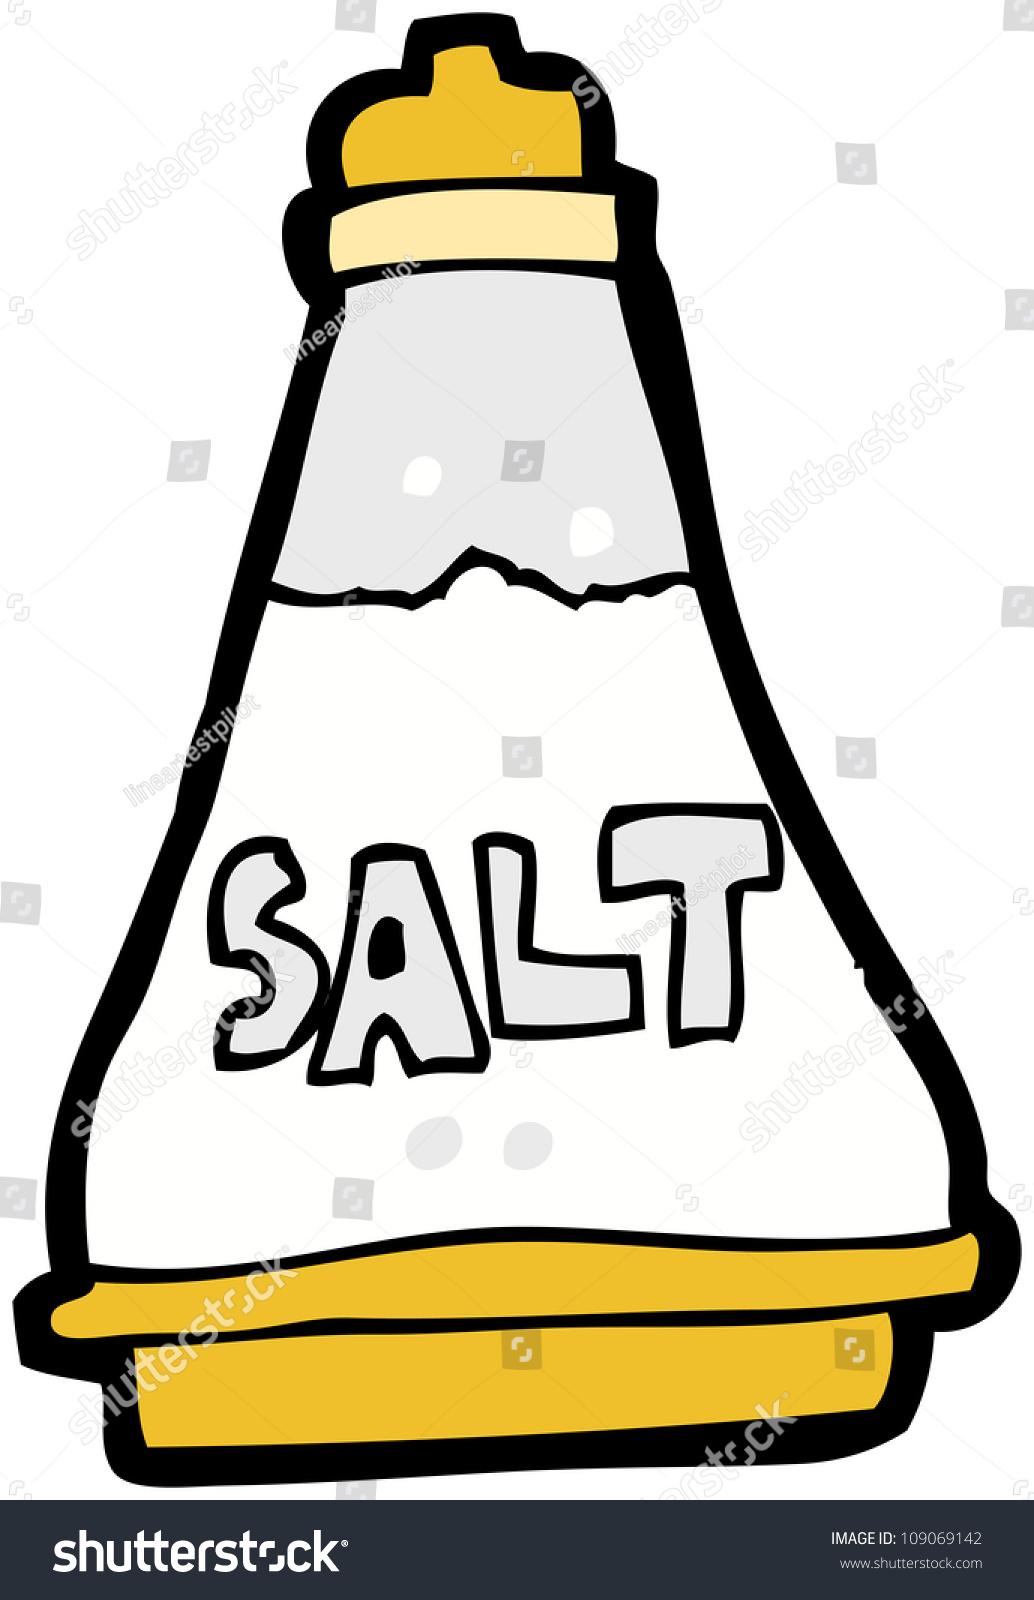 Sad Cartoon Salt Stock Vector - Image: 47334584